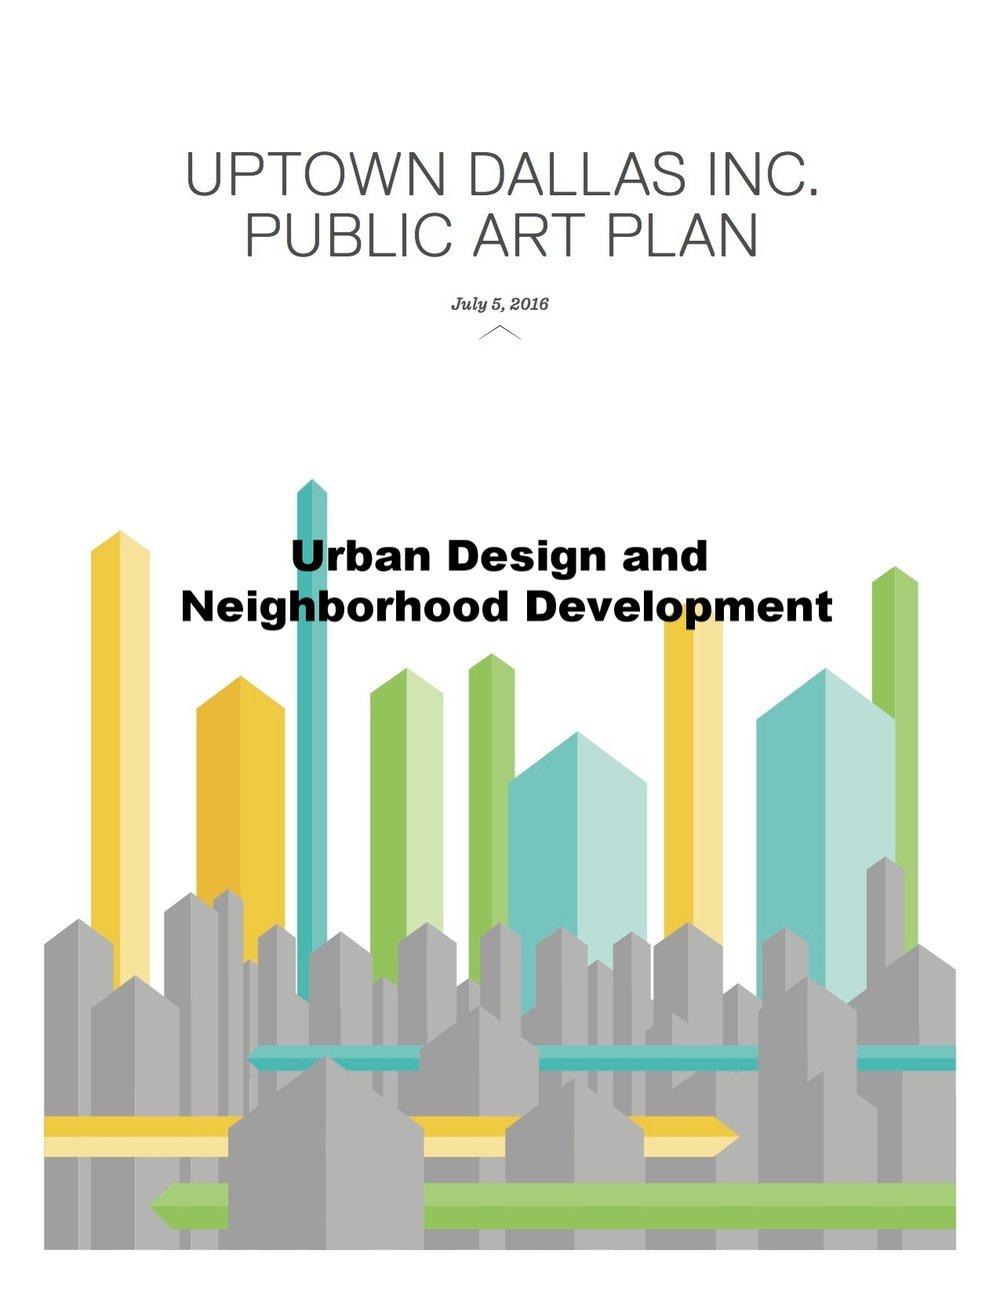 Urban Design and Neighborhood Development